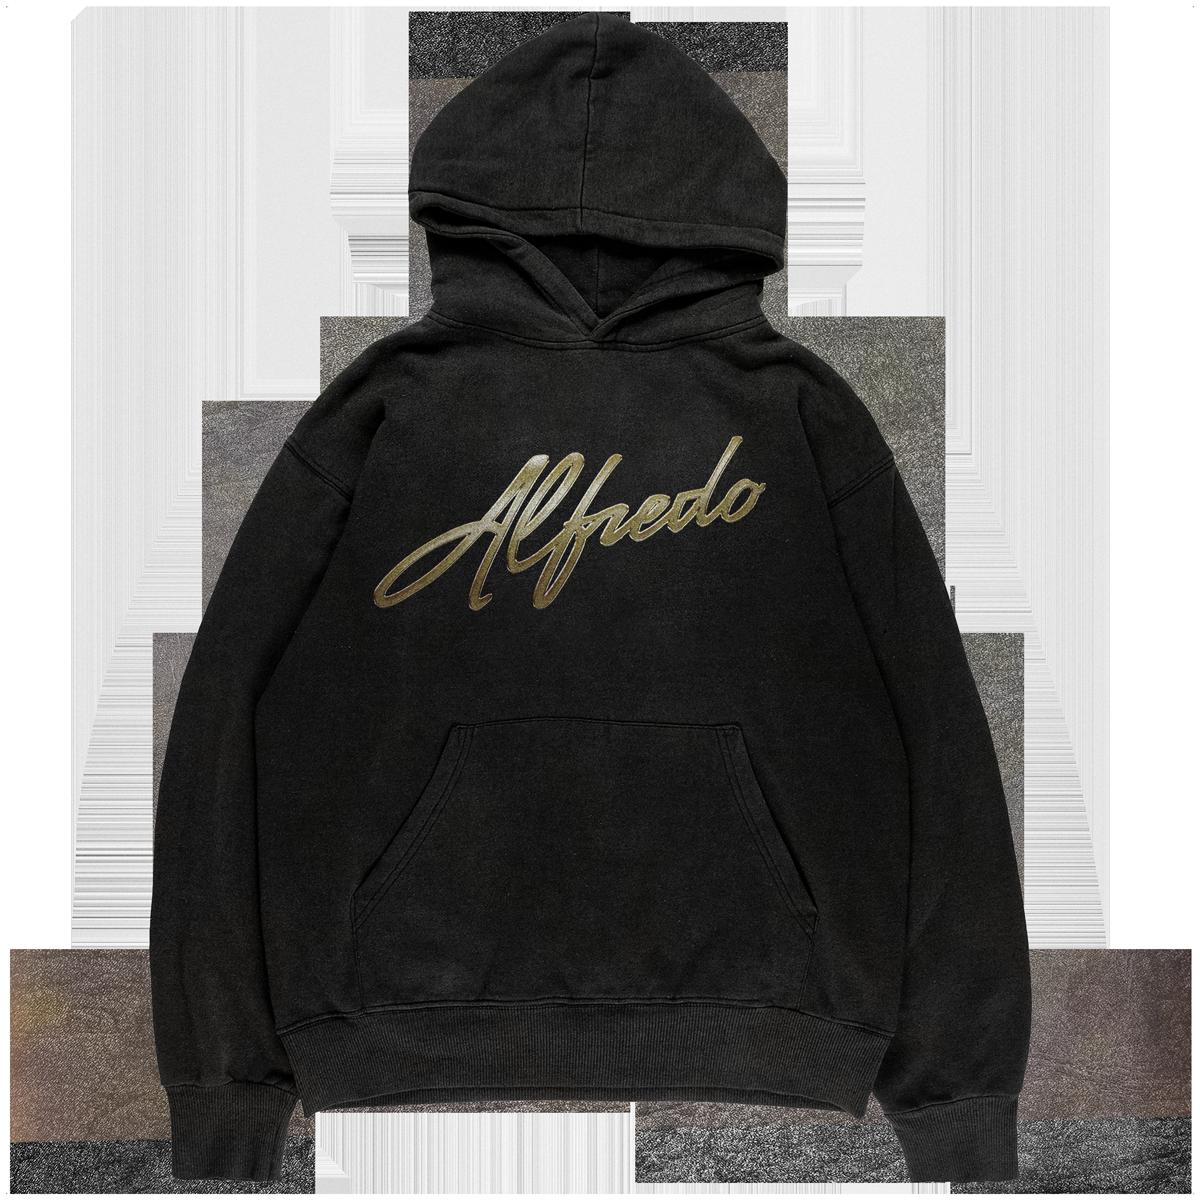 Alfredo AOTY Hoodie